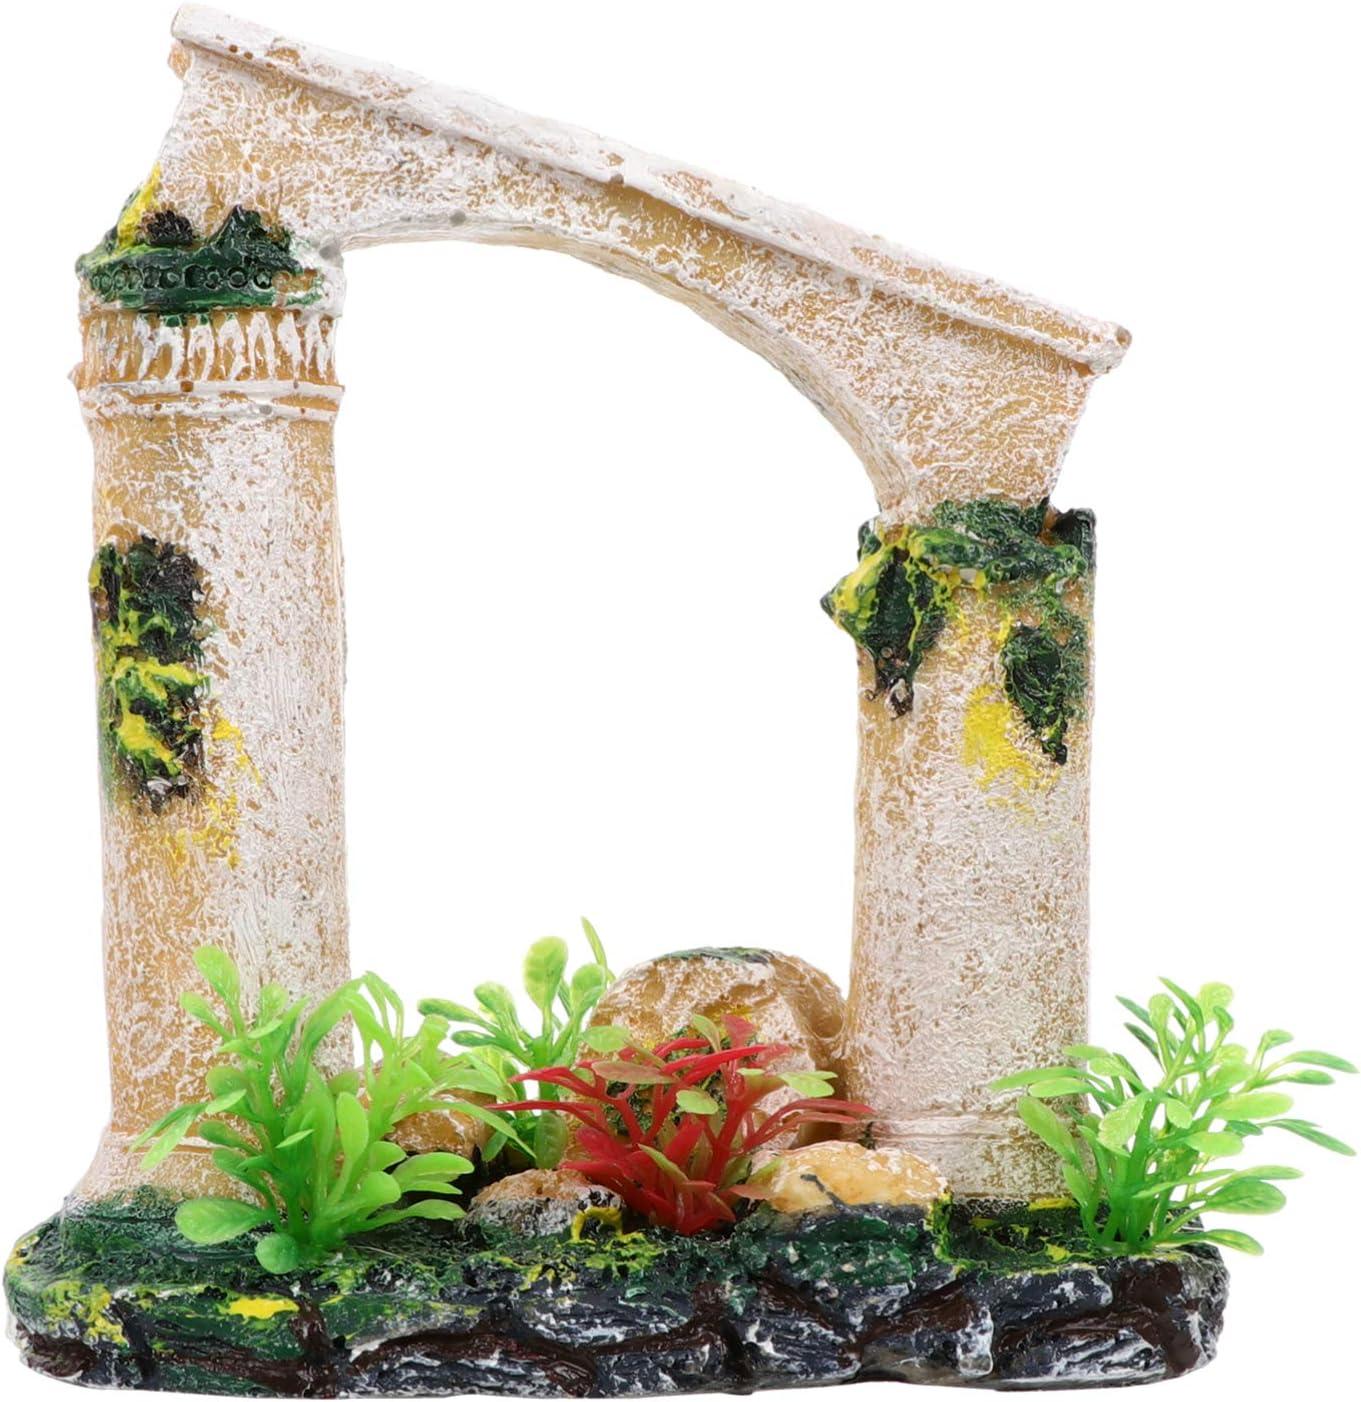 Balacoo Resin Roman Column Ornament Ancient Column Ruins Aquarium Decoration Fish Tank Plants Landscape Hideout for Miniature Fairy Garden Decor